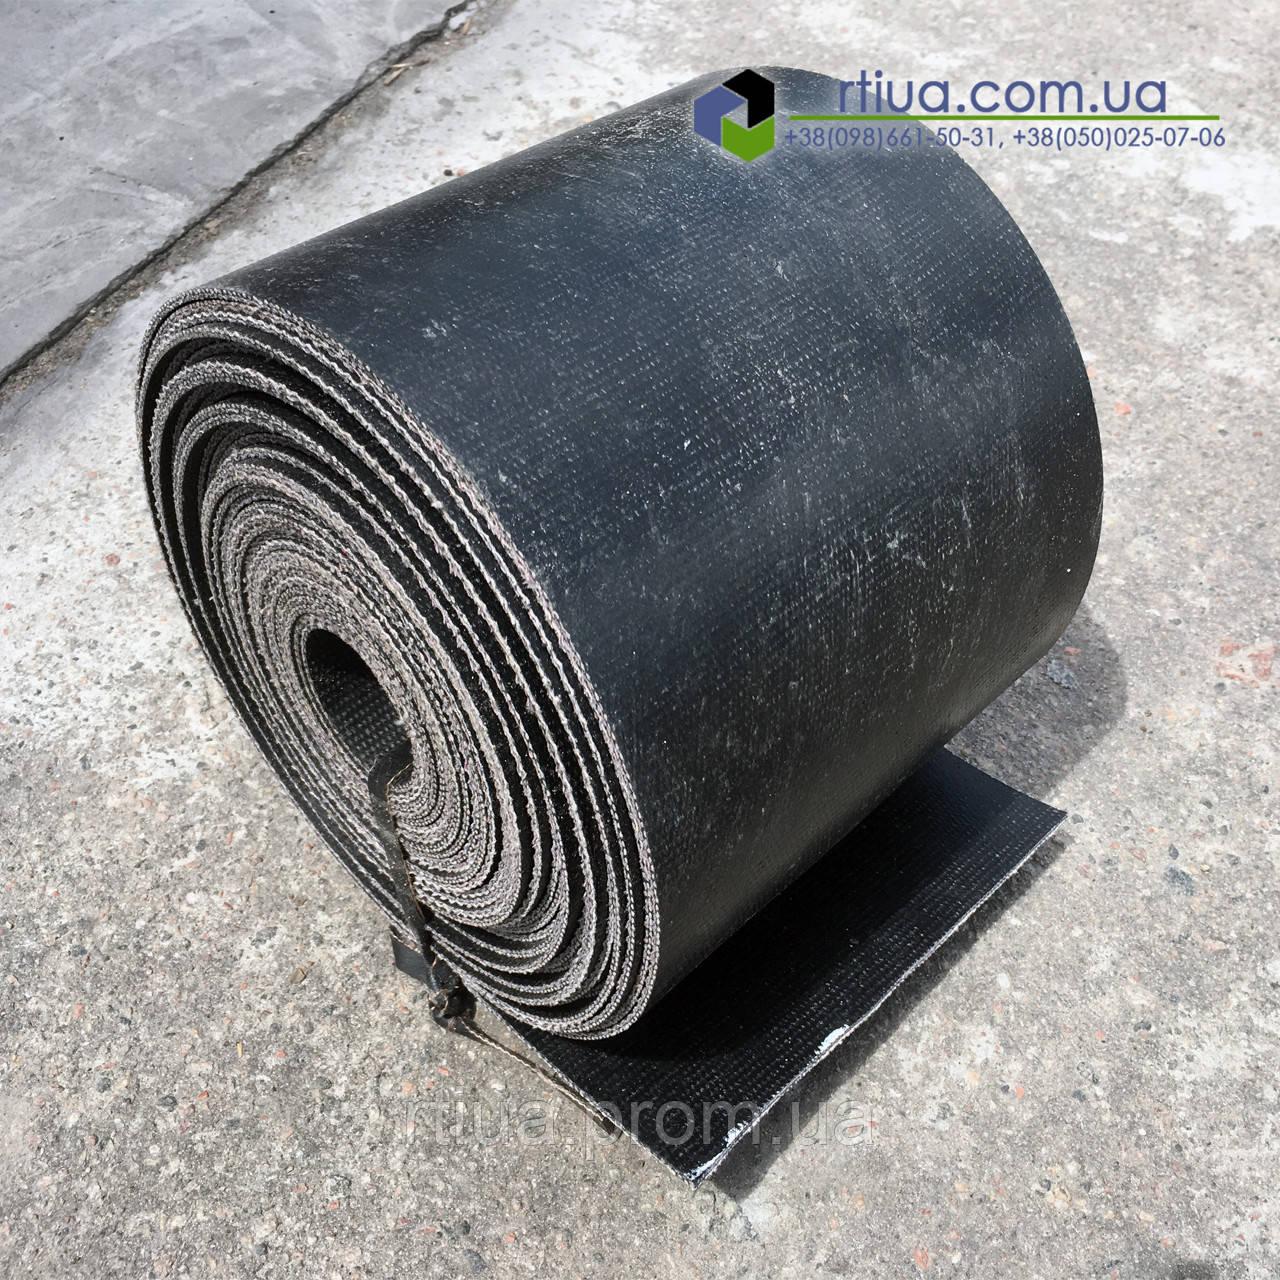 Транспортерная лента ТК-200, 1400х5 - 5/2 (12 мм)